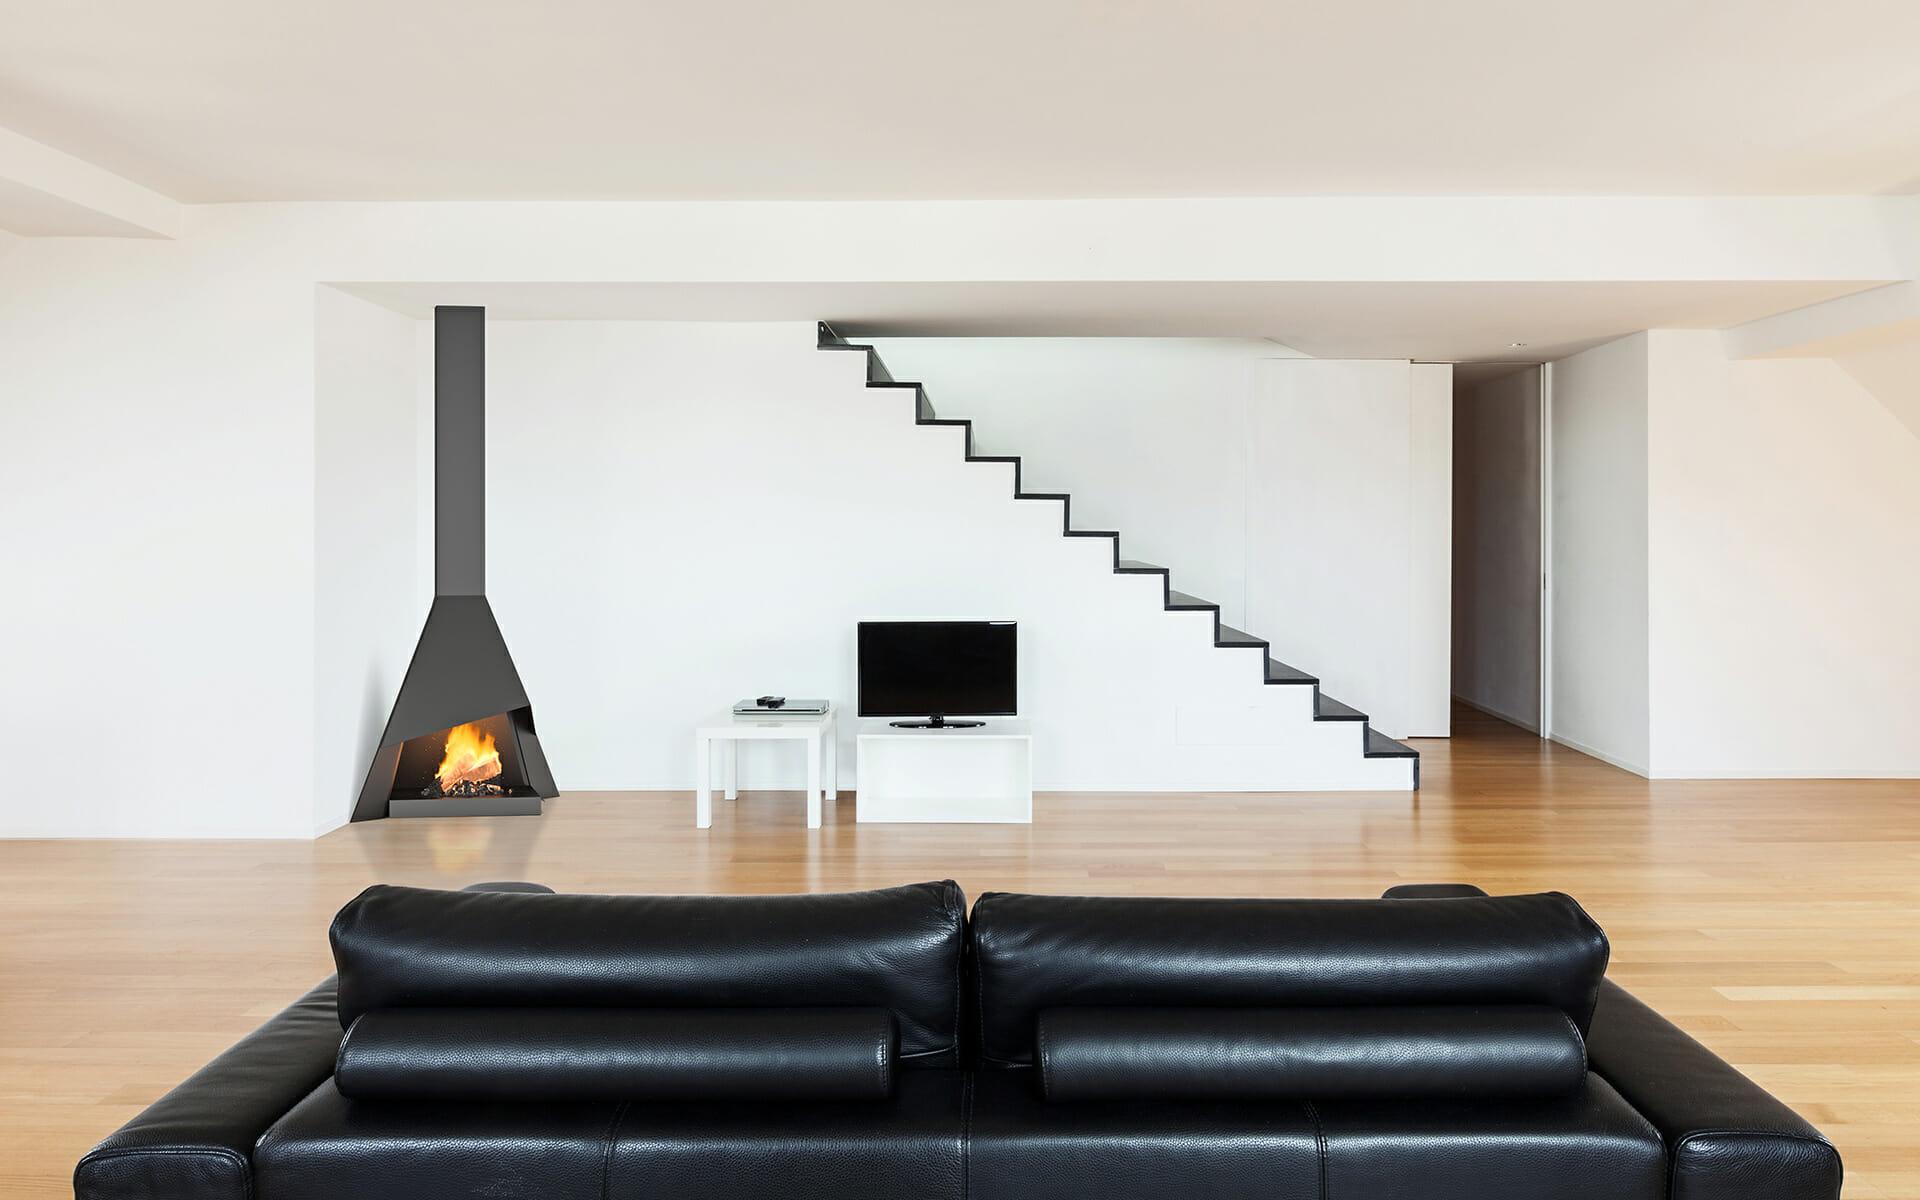 Chimenea_metálica_de diseño_moderno